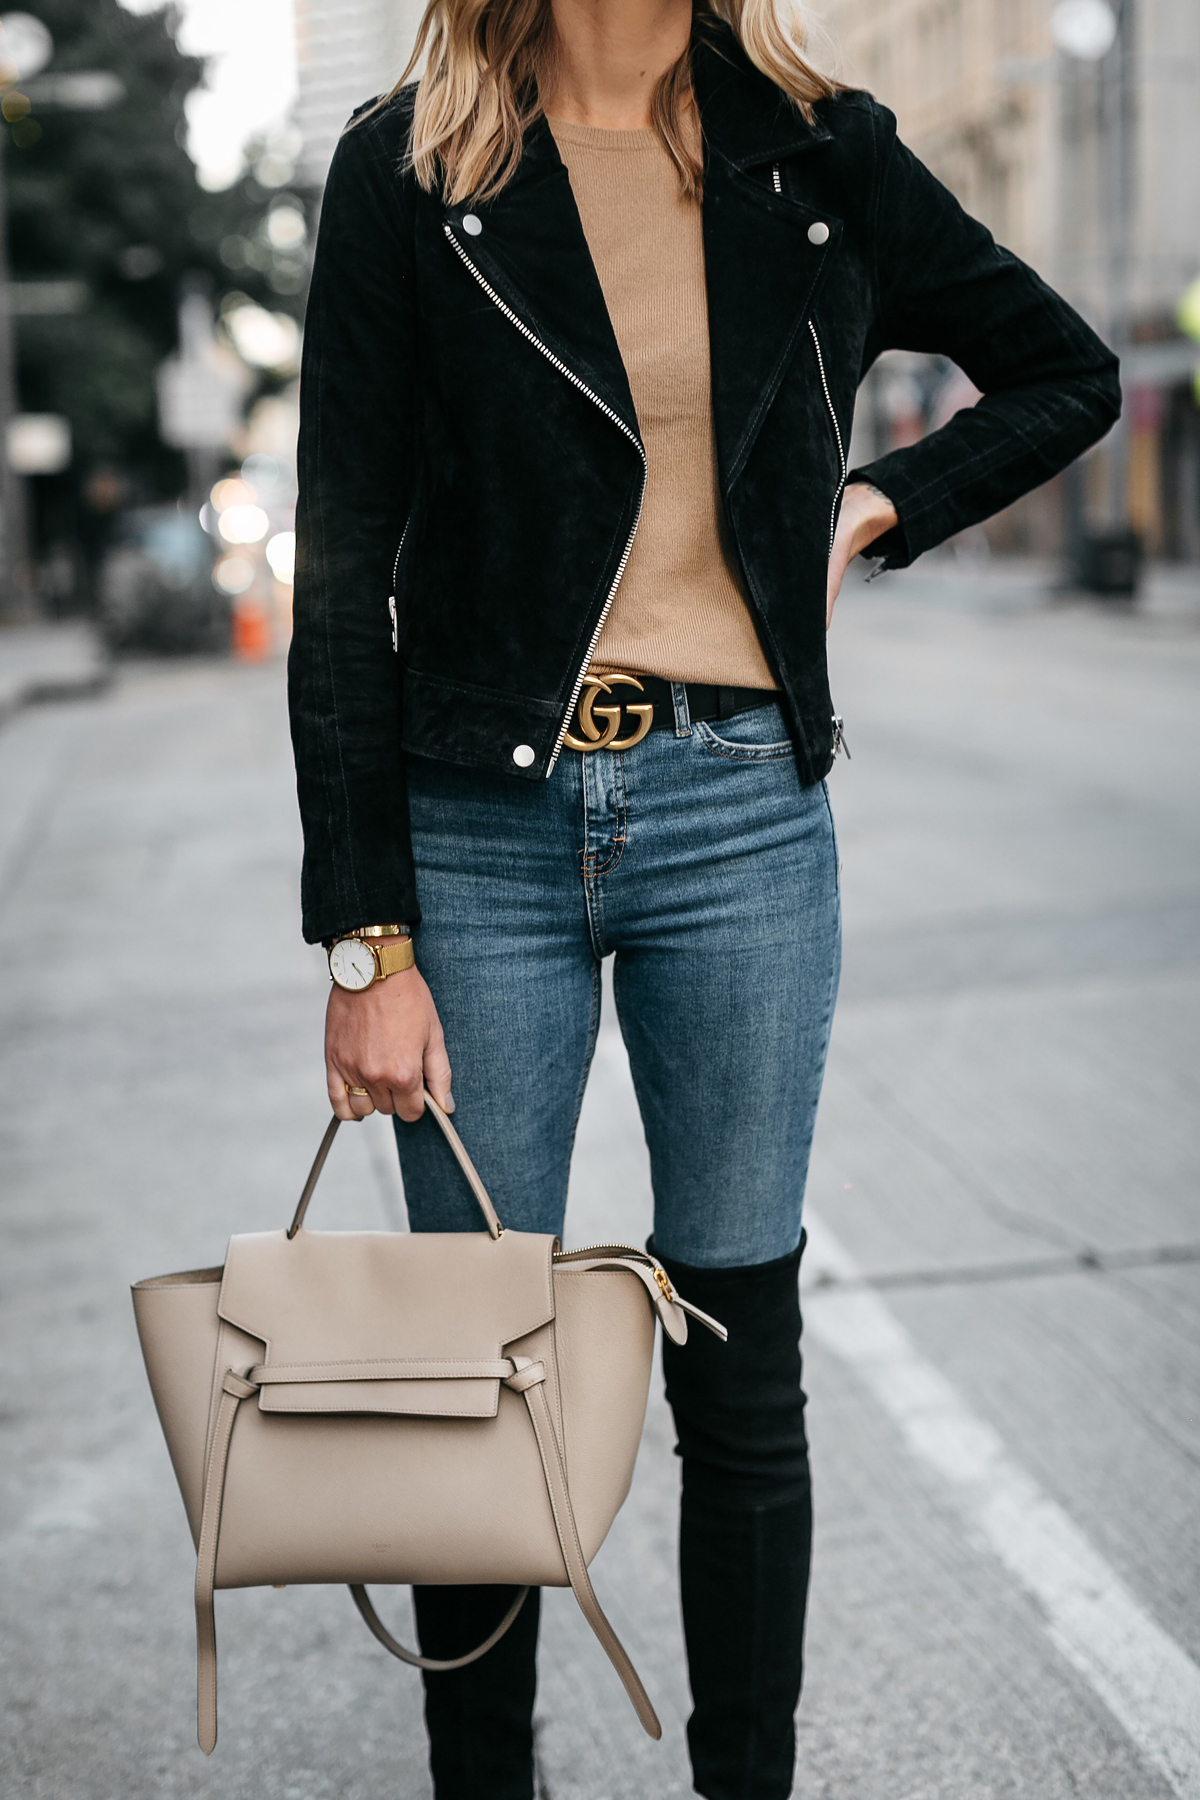 fb48d380666 Black Suede Moto Jacket Camel Sweater Denim Skinny Jeans Stuart Weitzman  Over-the-Knee